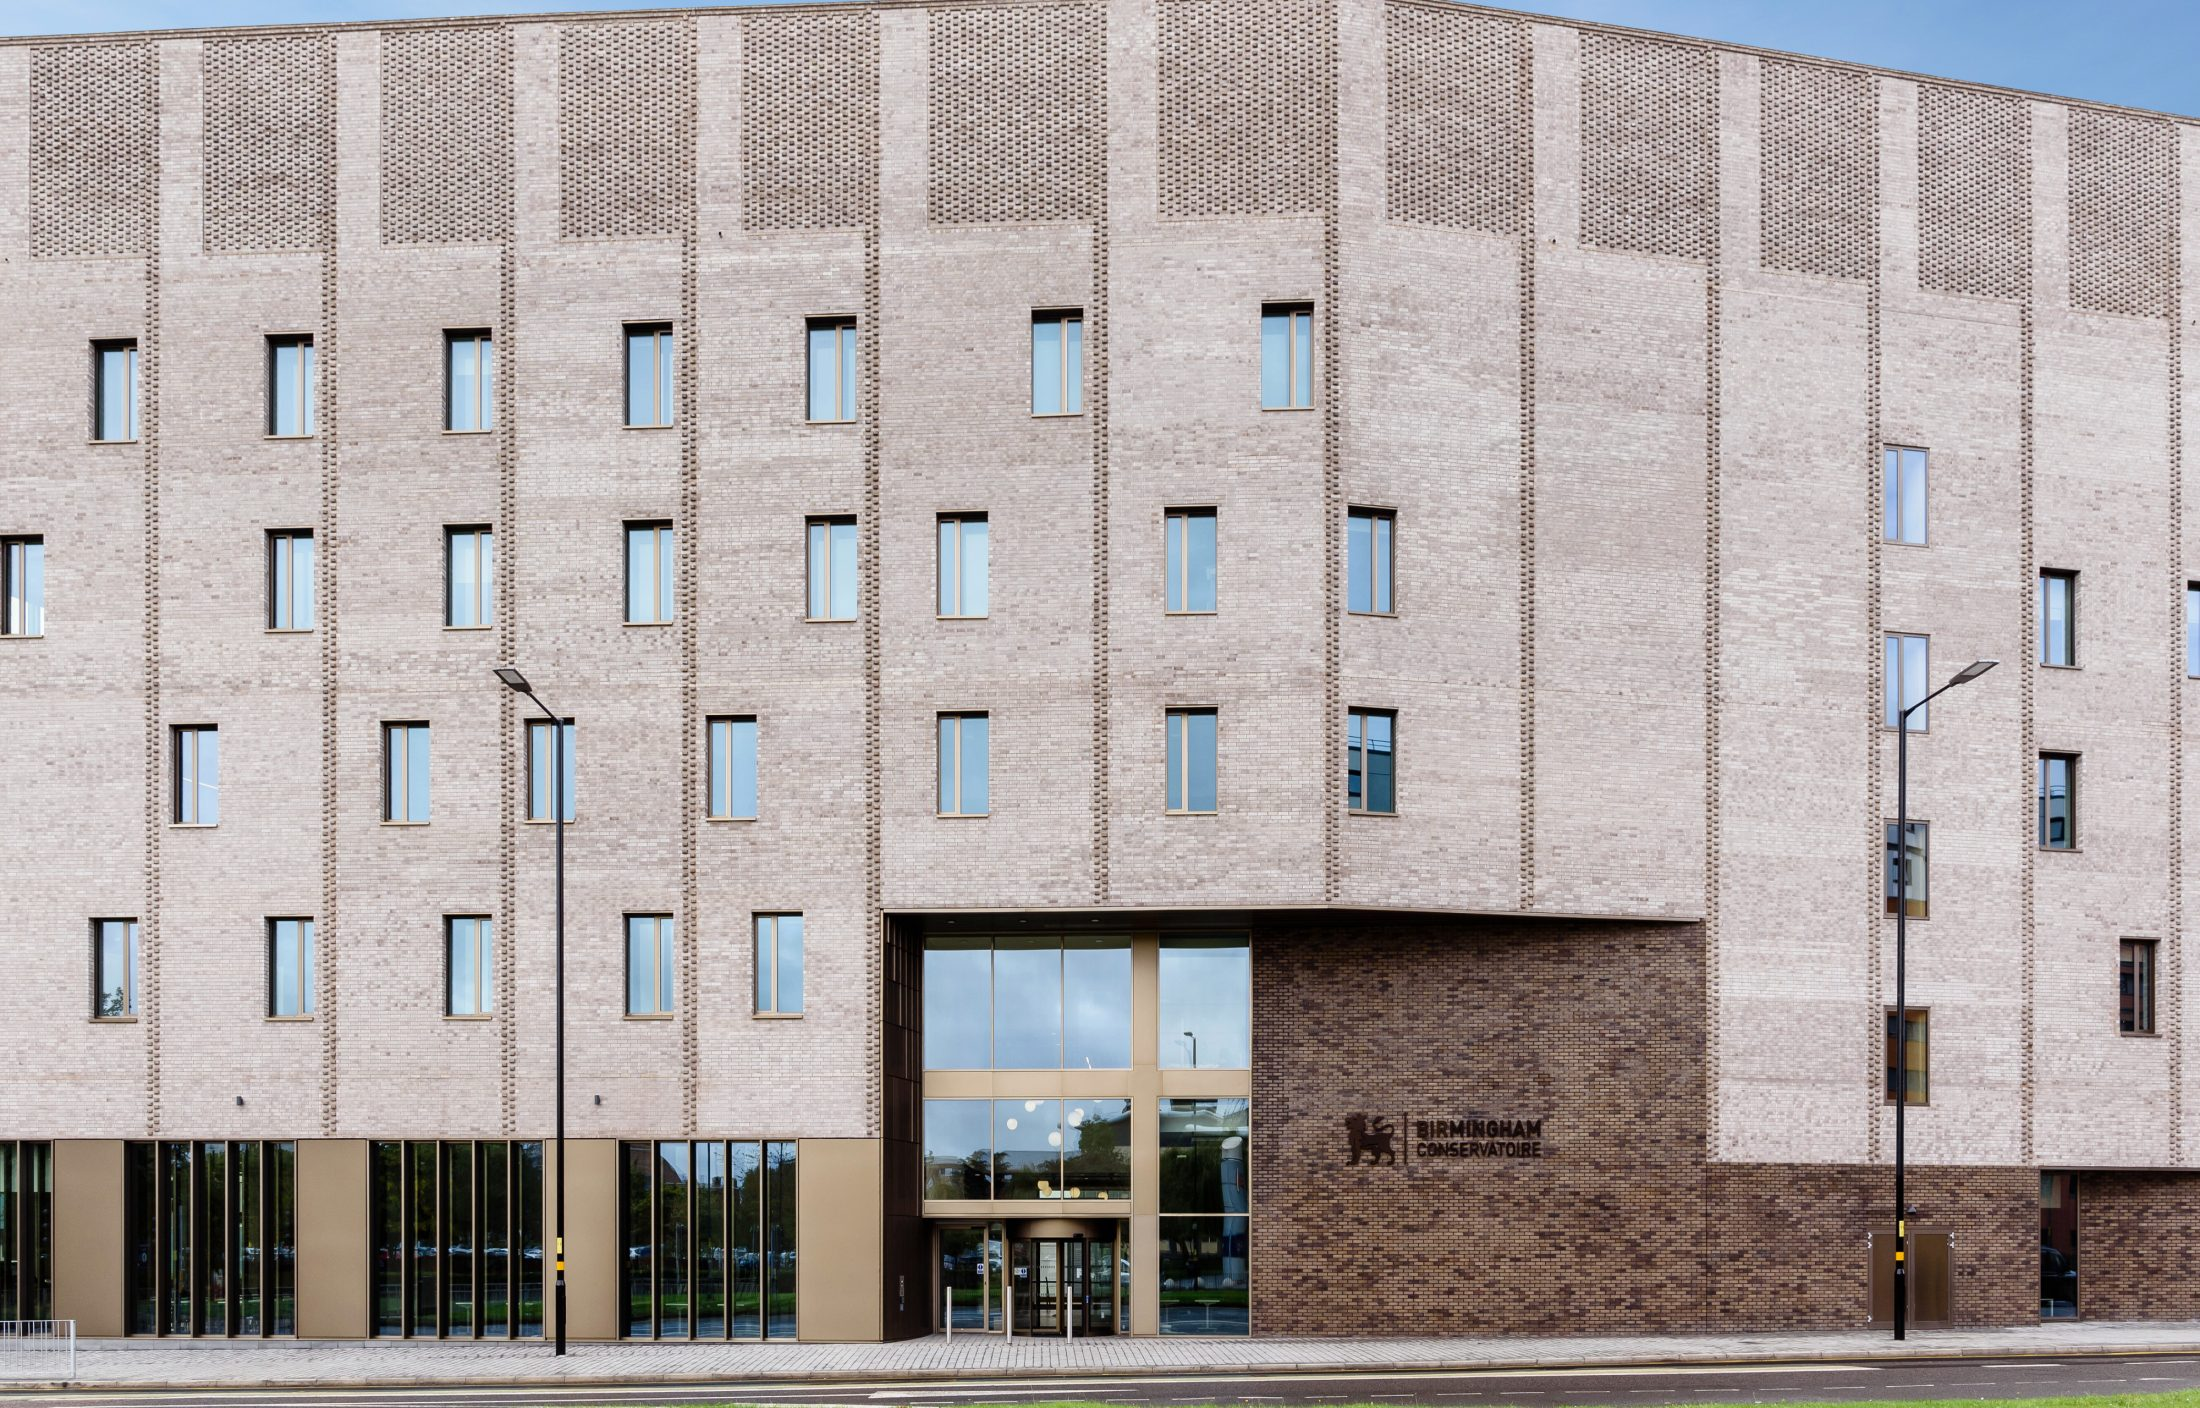 Birmingham Conservatoire West Midlands Property Awards